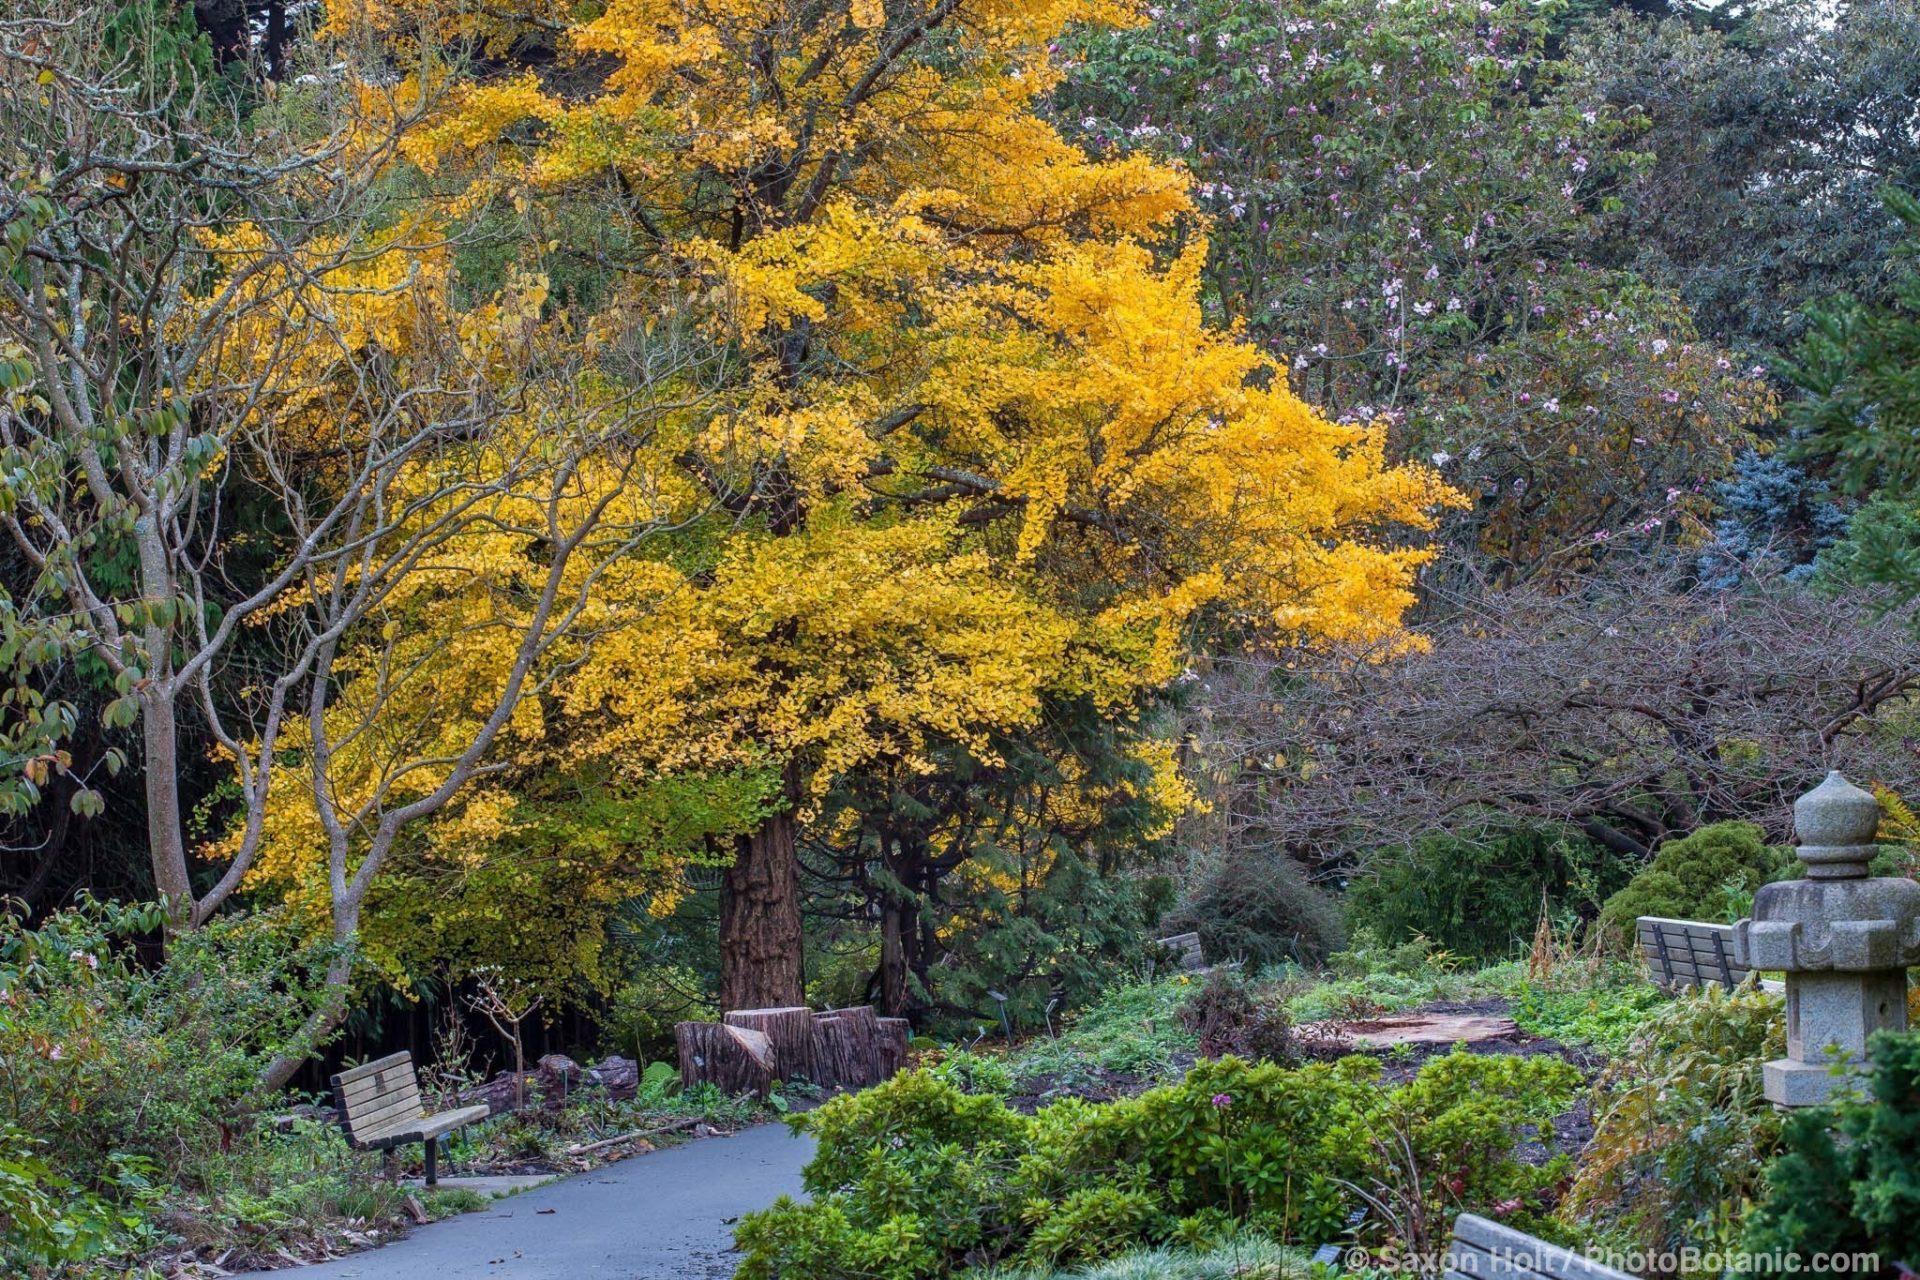 Ginkgo biloba tree wiht yellow falll foliage color in San Francisco Botanical Garden